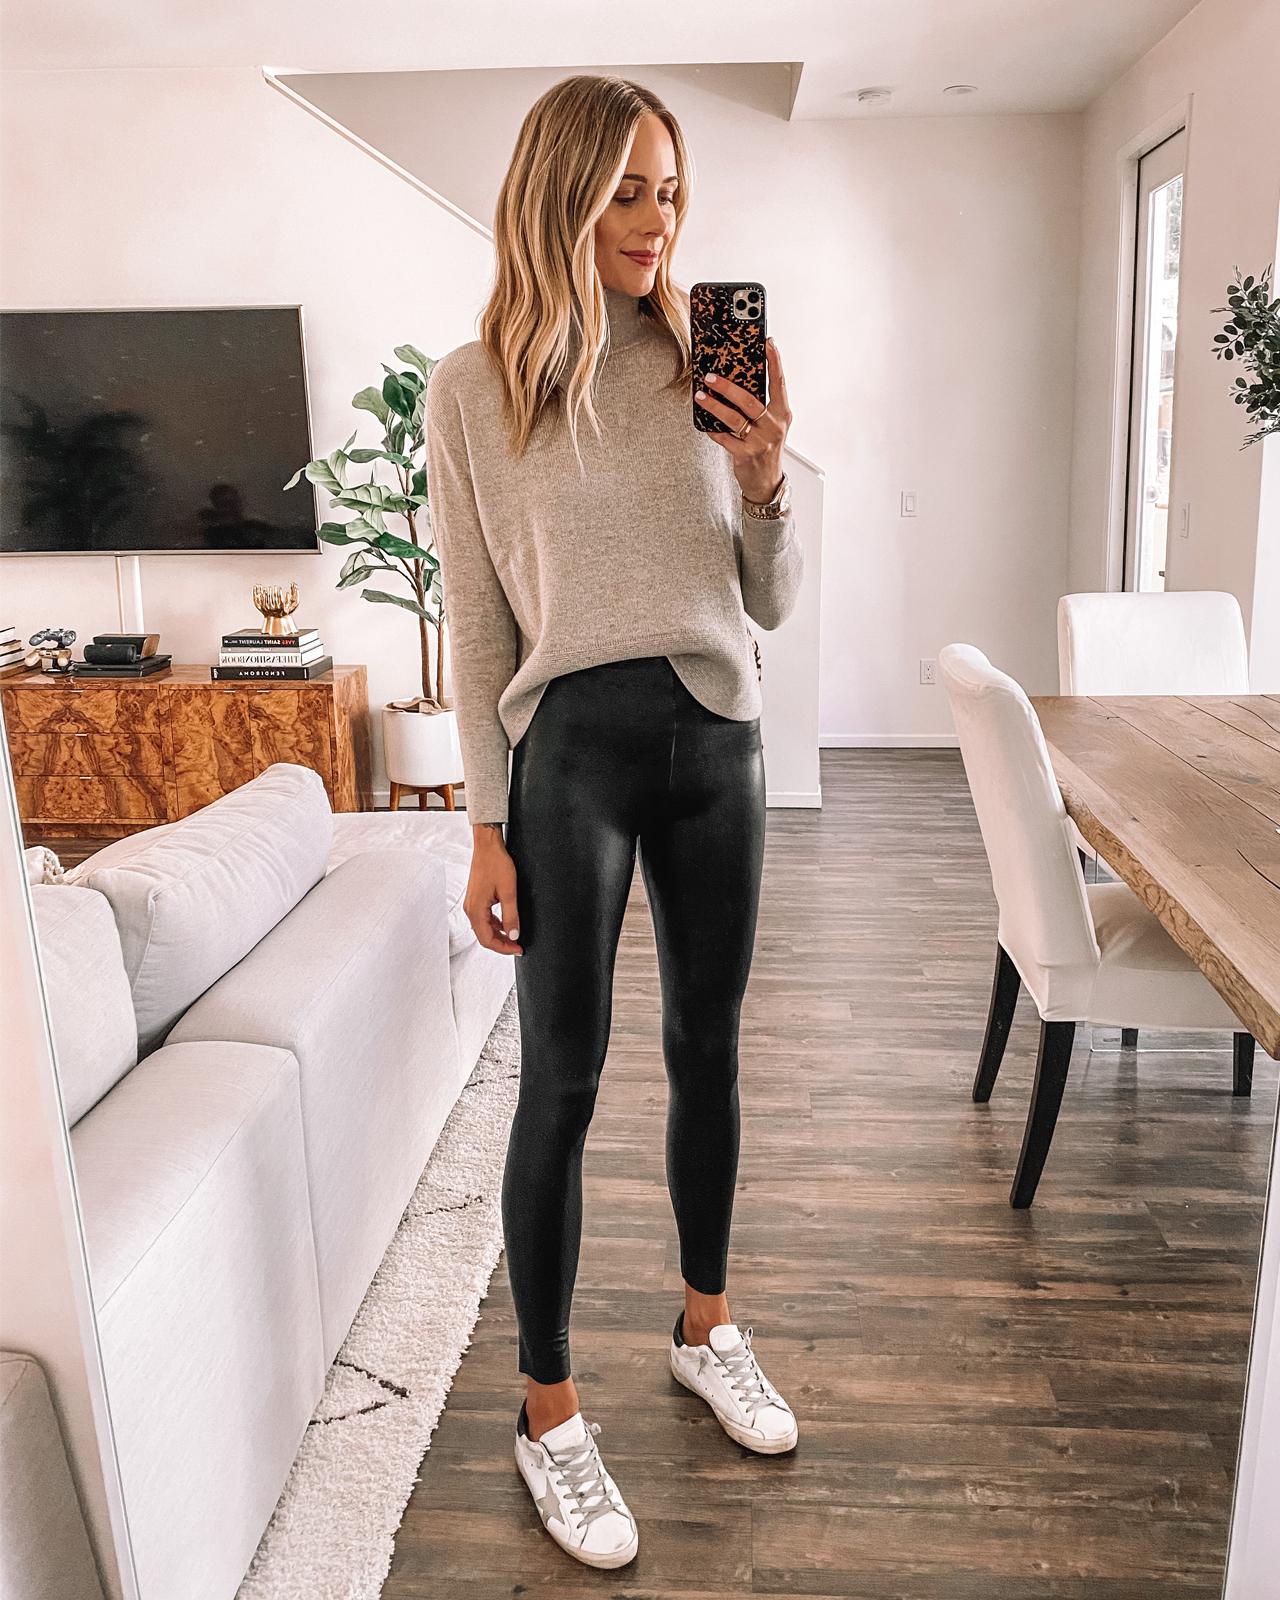 Fashion Jackson Wearing Everlane Taupe Turtleneck Sweater Commando Faux Leather Leggings Leggings Golden Goose Sneakers